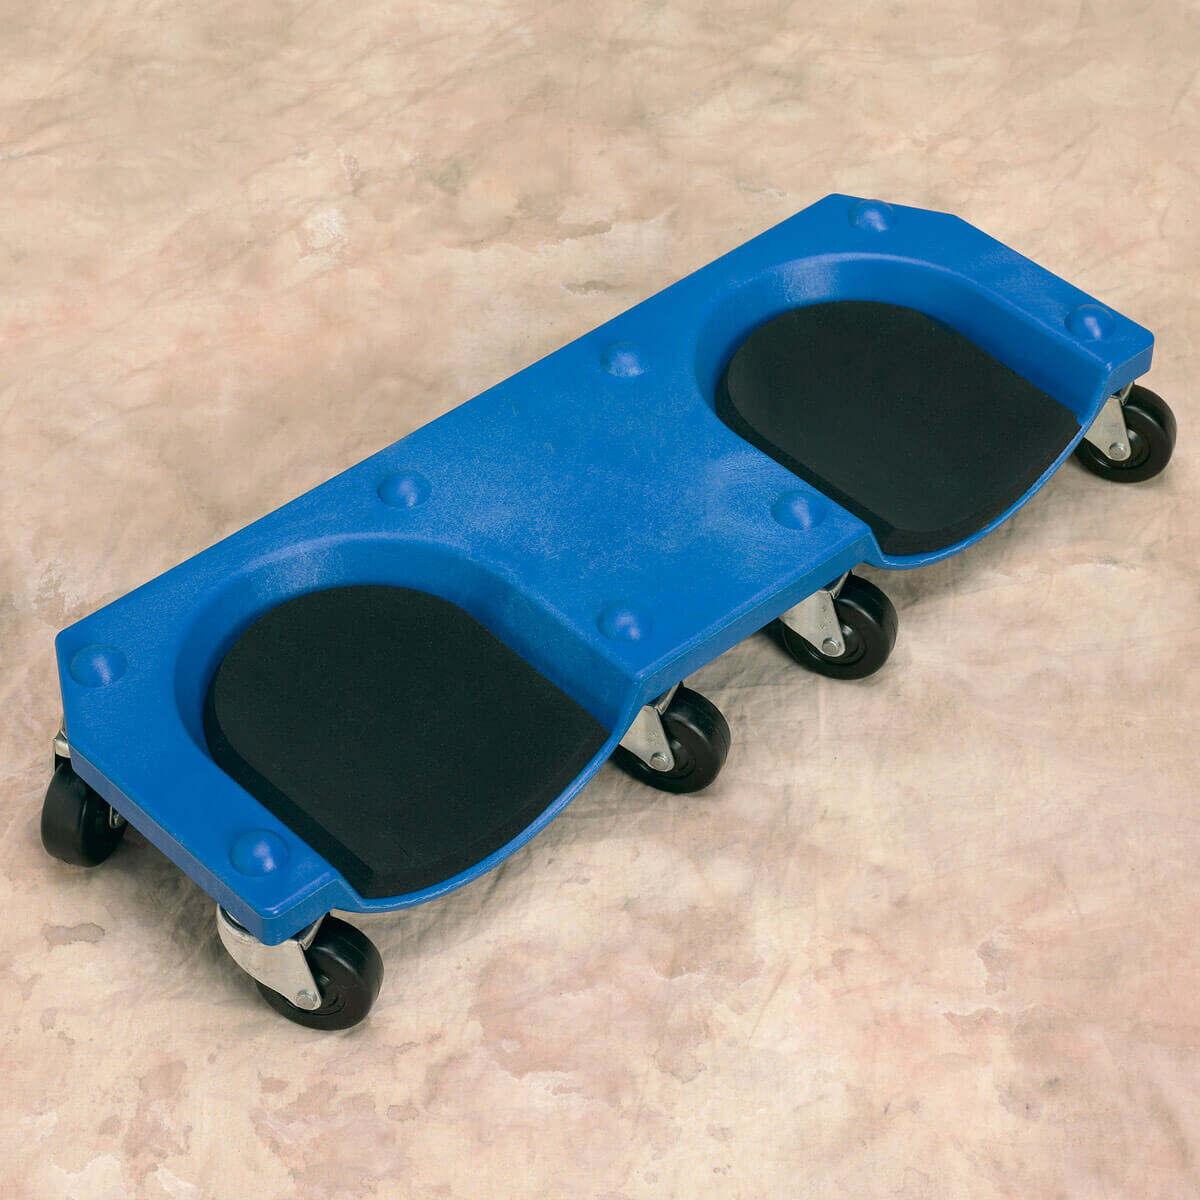 Knee Pad With Wheels